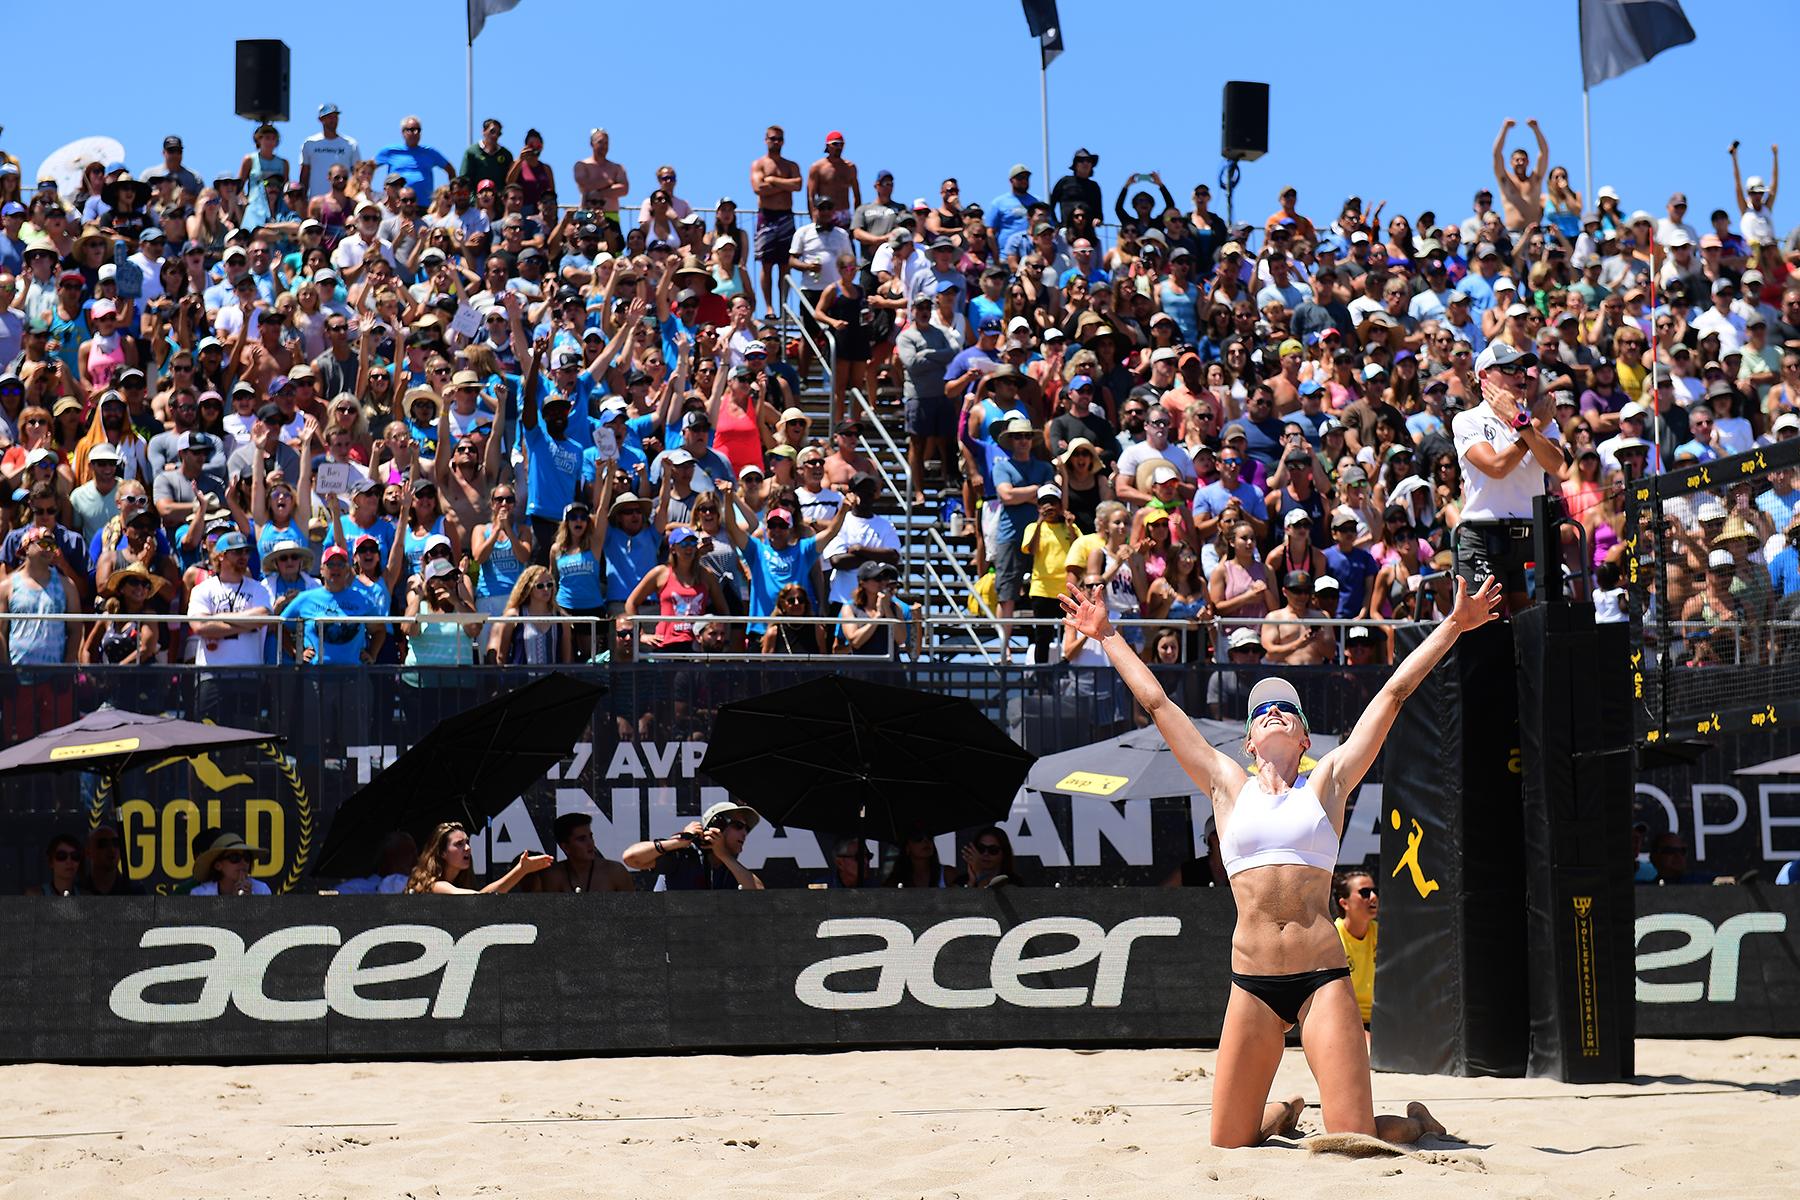 2017 Avp Gold Series Manhattan Beach Open Presented By Acer 8 20 17